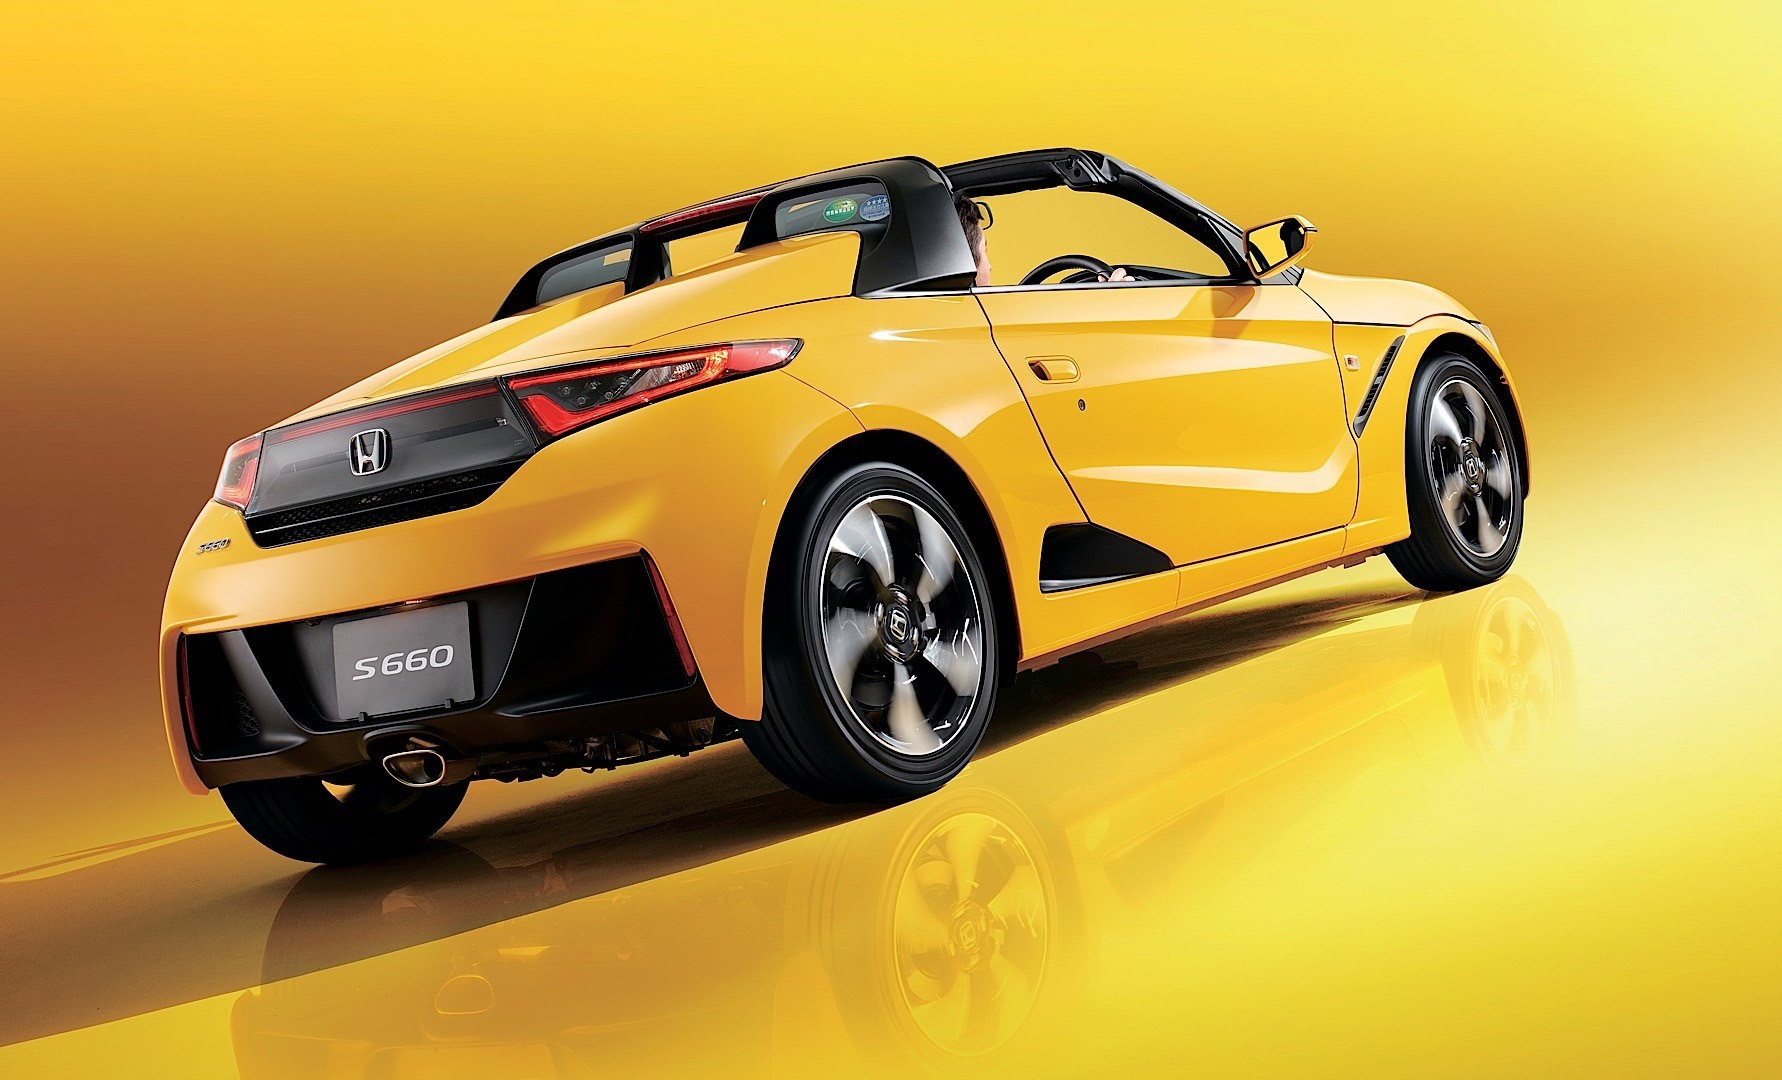 honda s660 cars autoevolution specs release present 2021